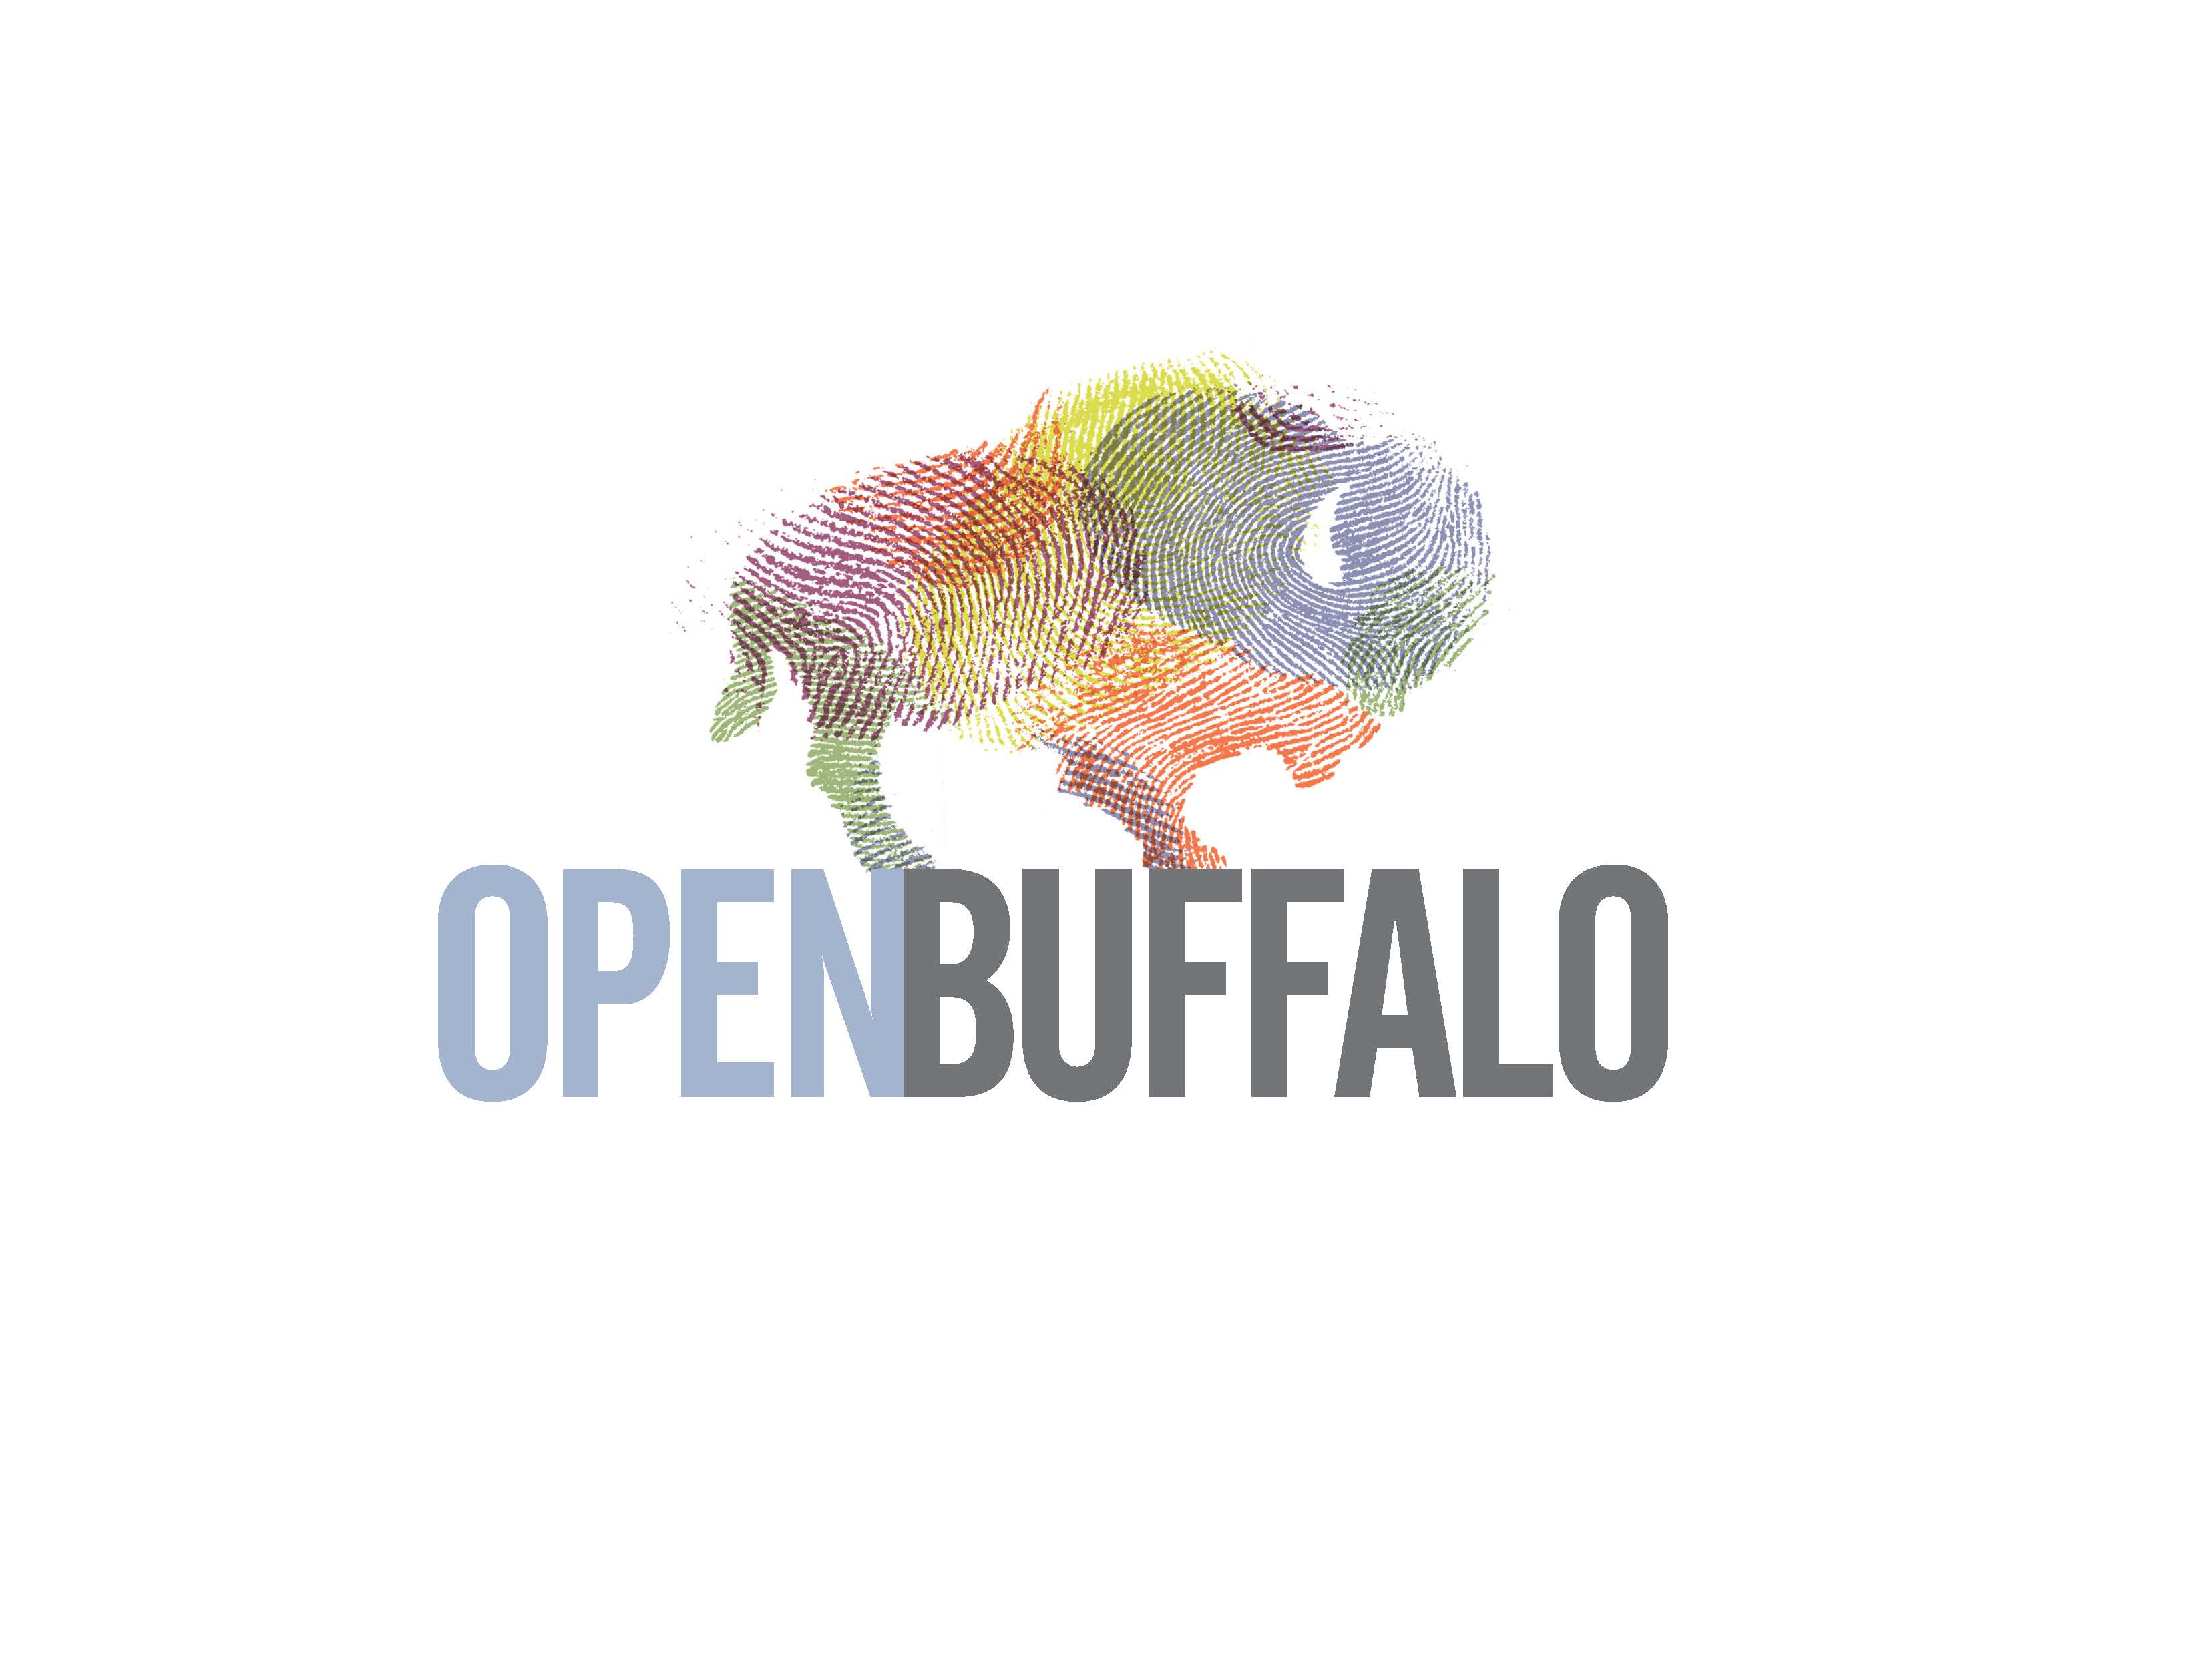 Peoples platform event to present blueprint for better buffalo peoples platform event to present blueprint for better buffalo malvernweather Images